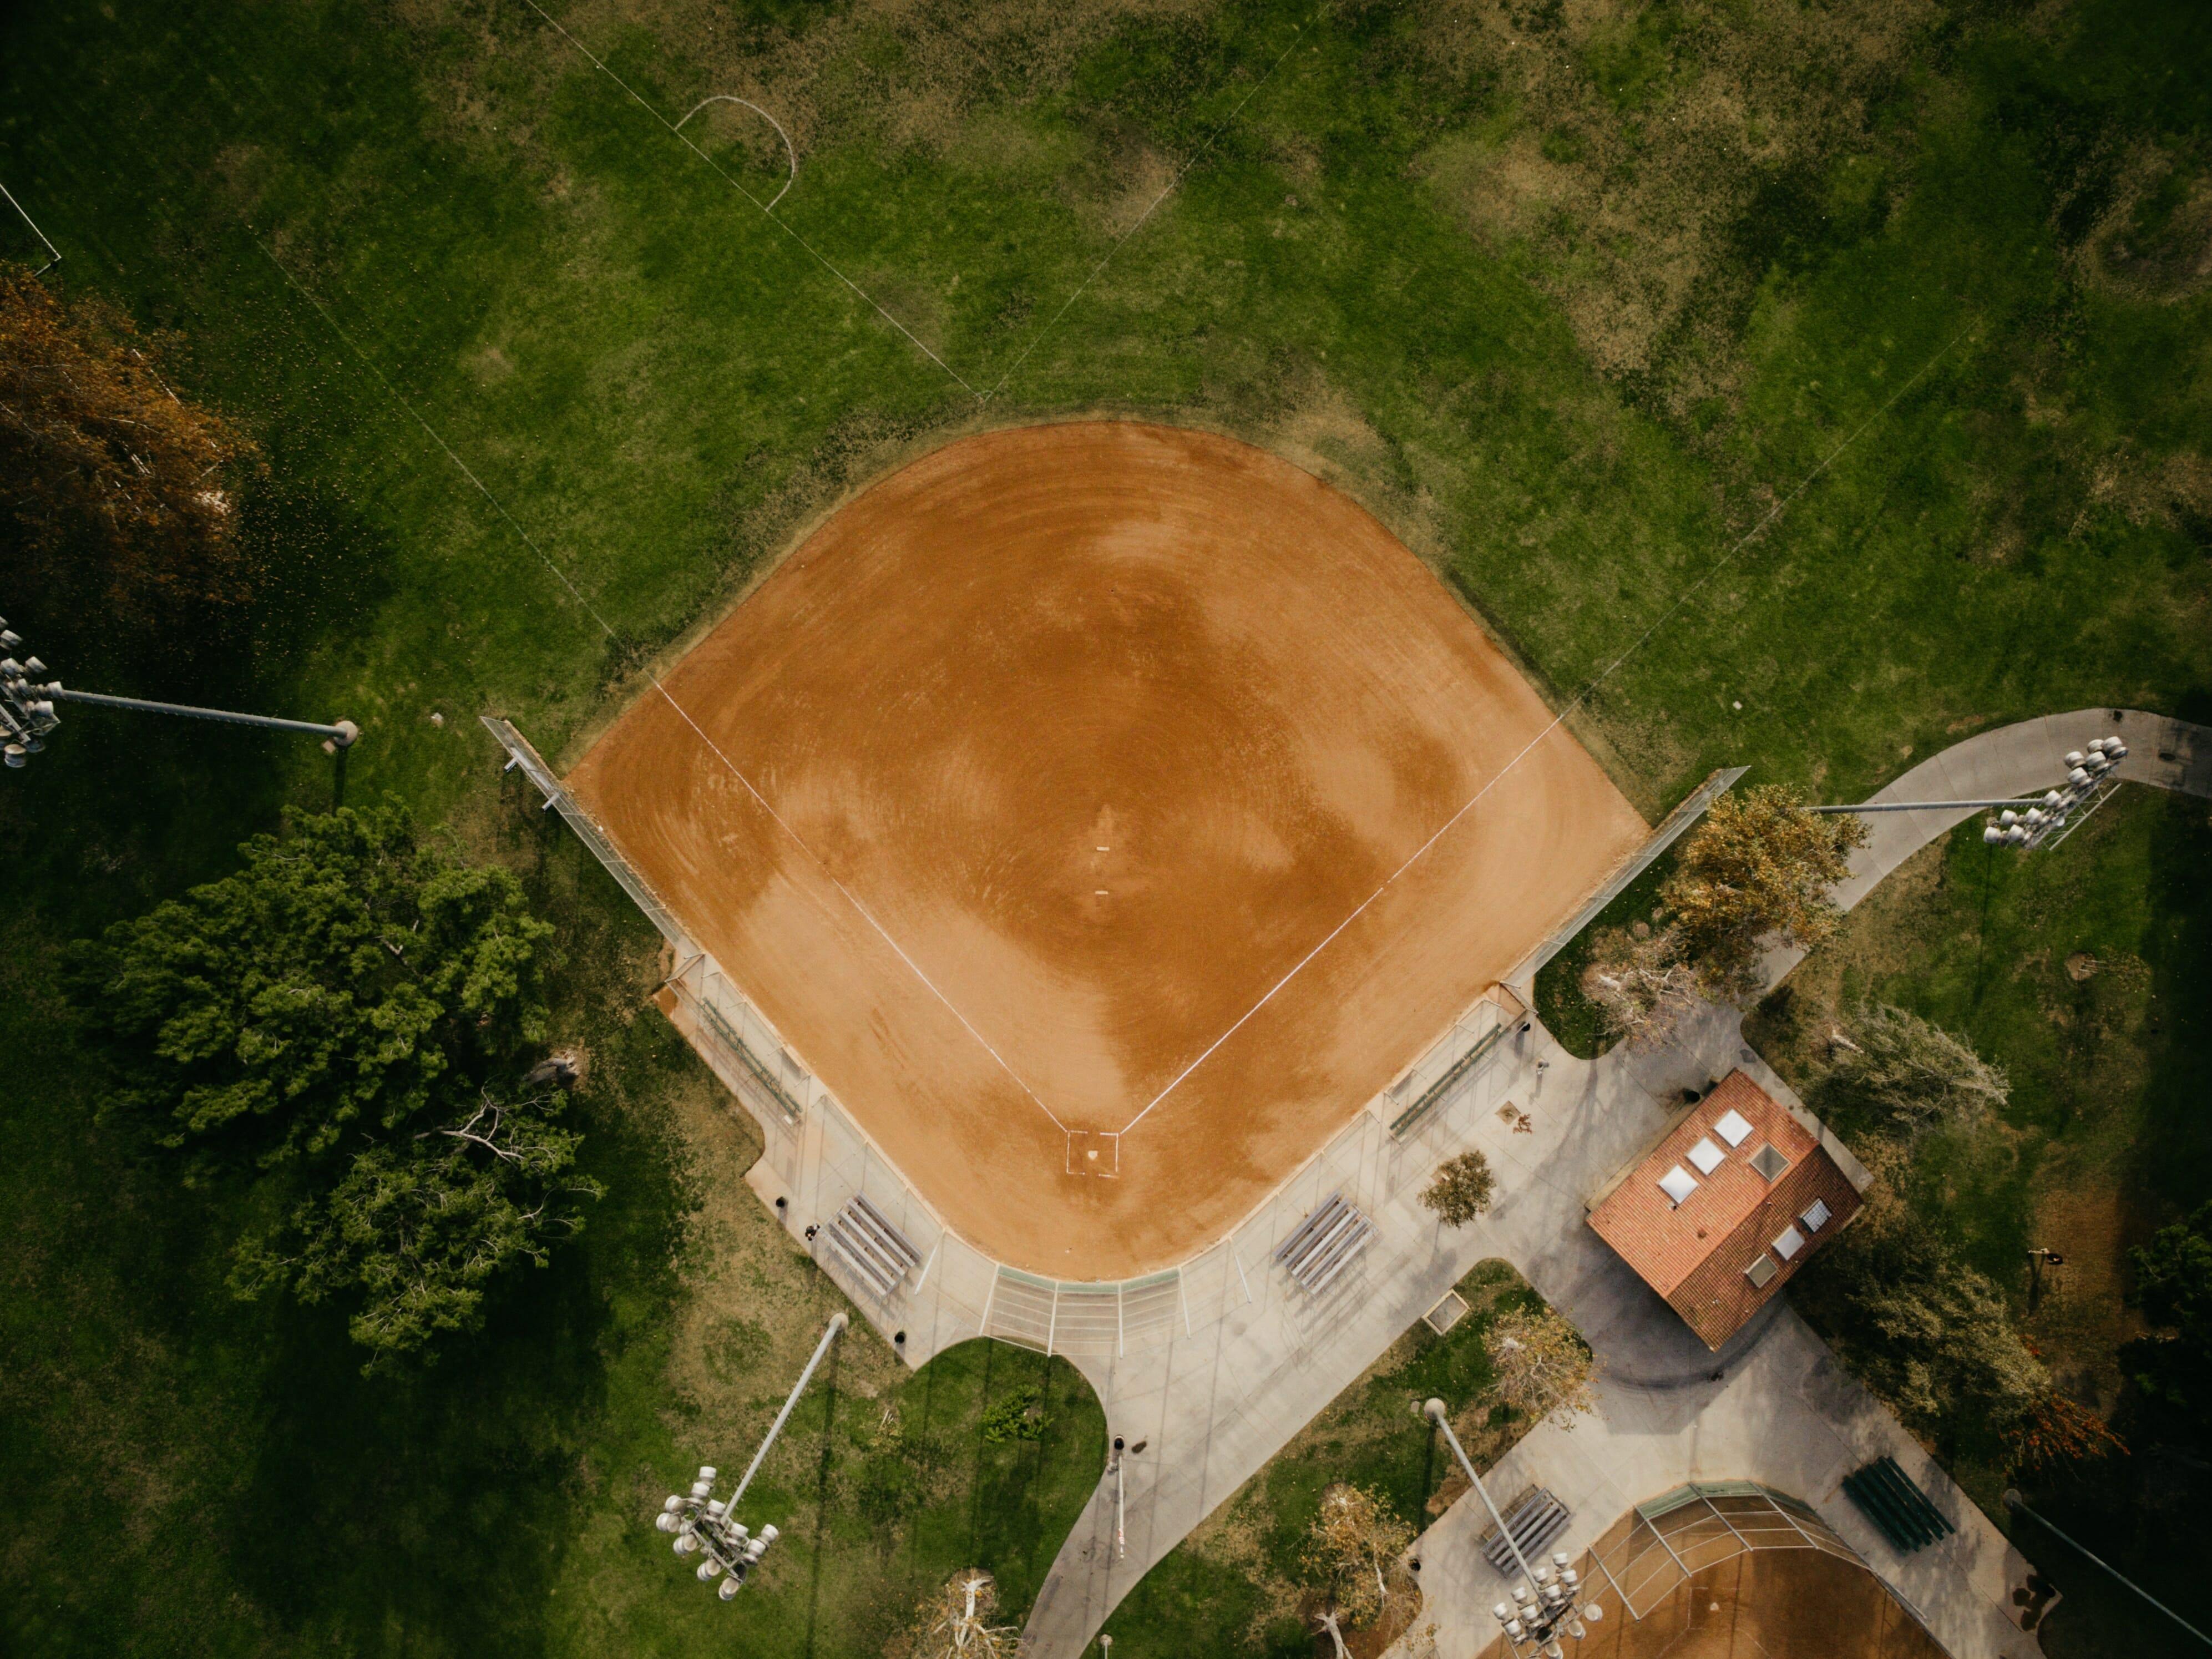 A Story Realized on a Softball Field